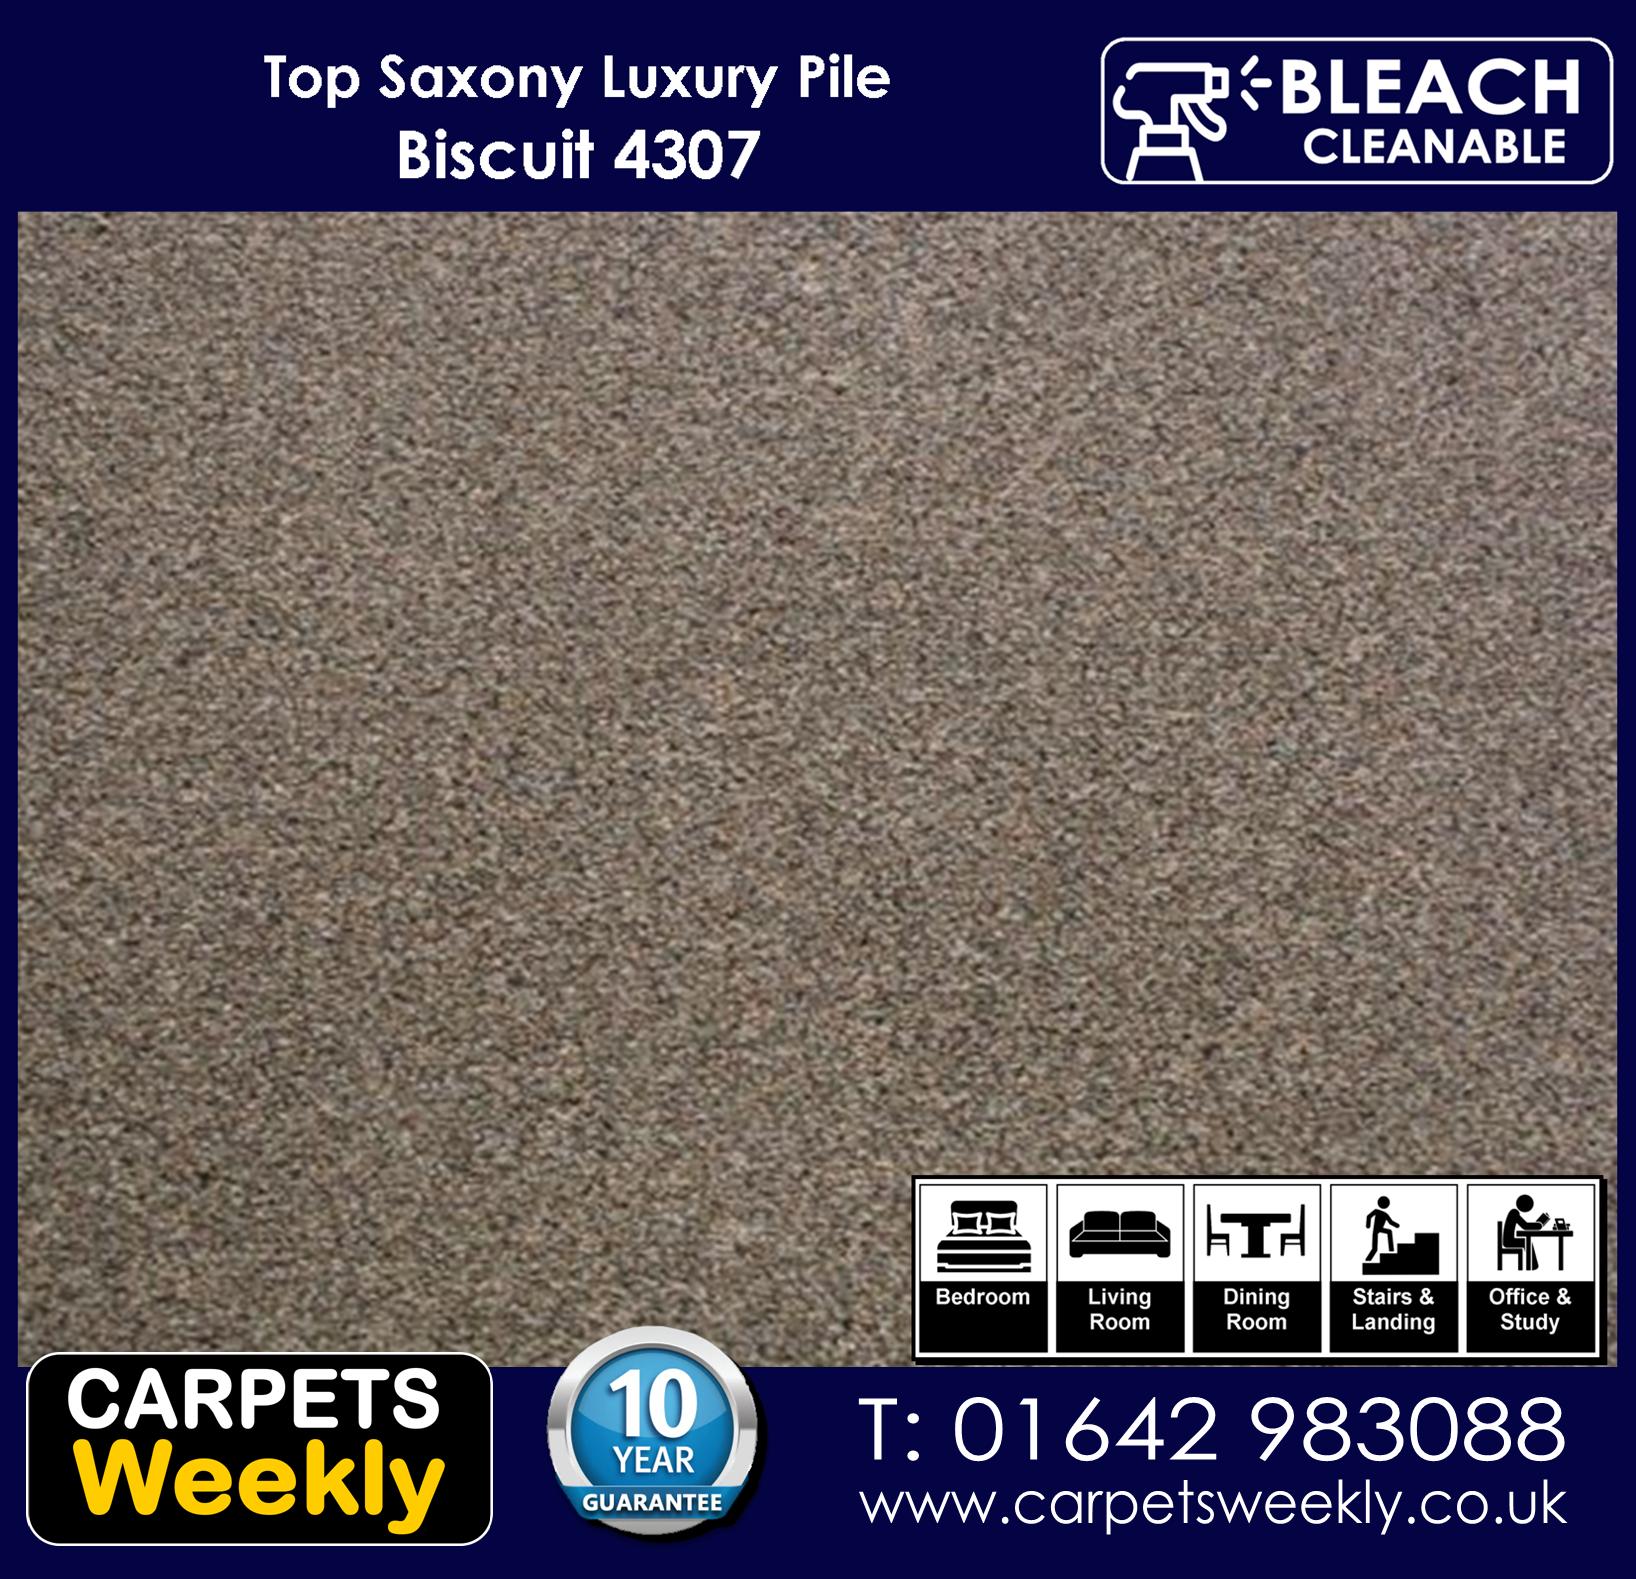 Top Saxony Biscuit 4307 carpet. Carpets Weekly